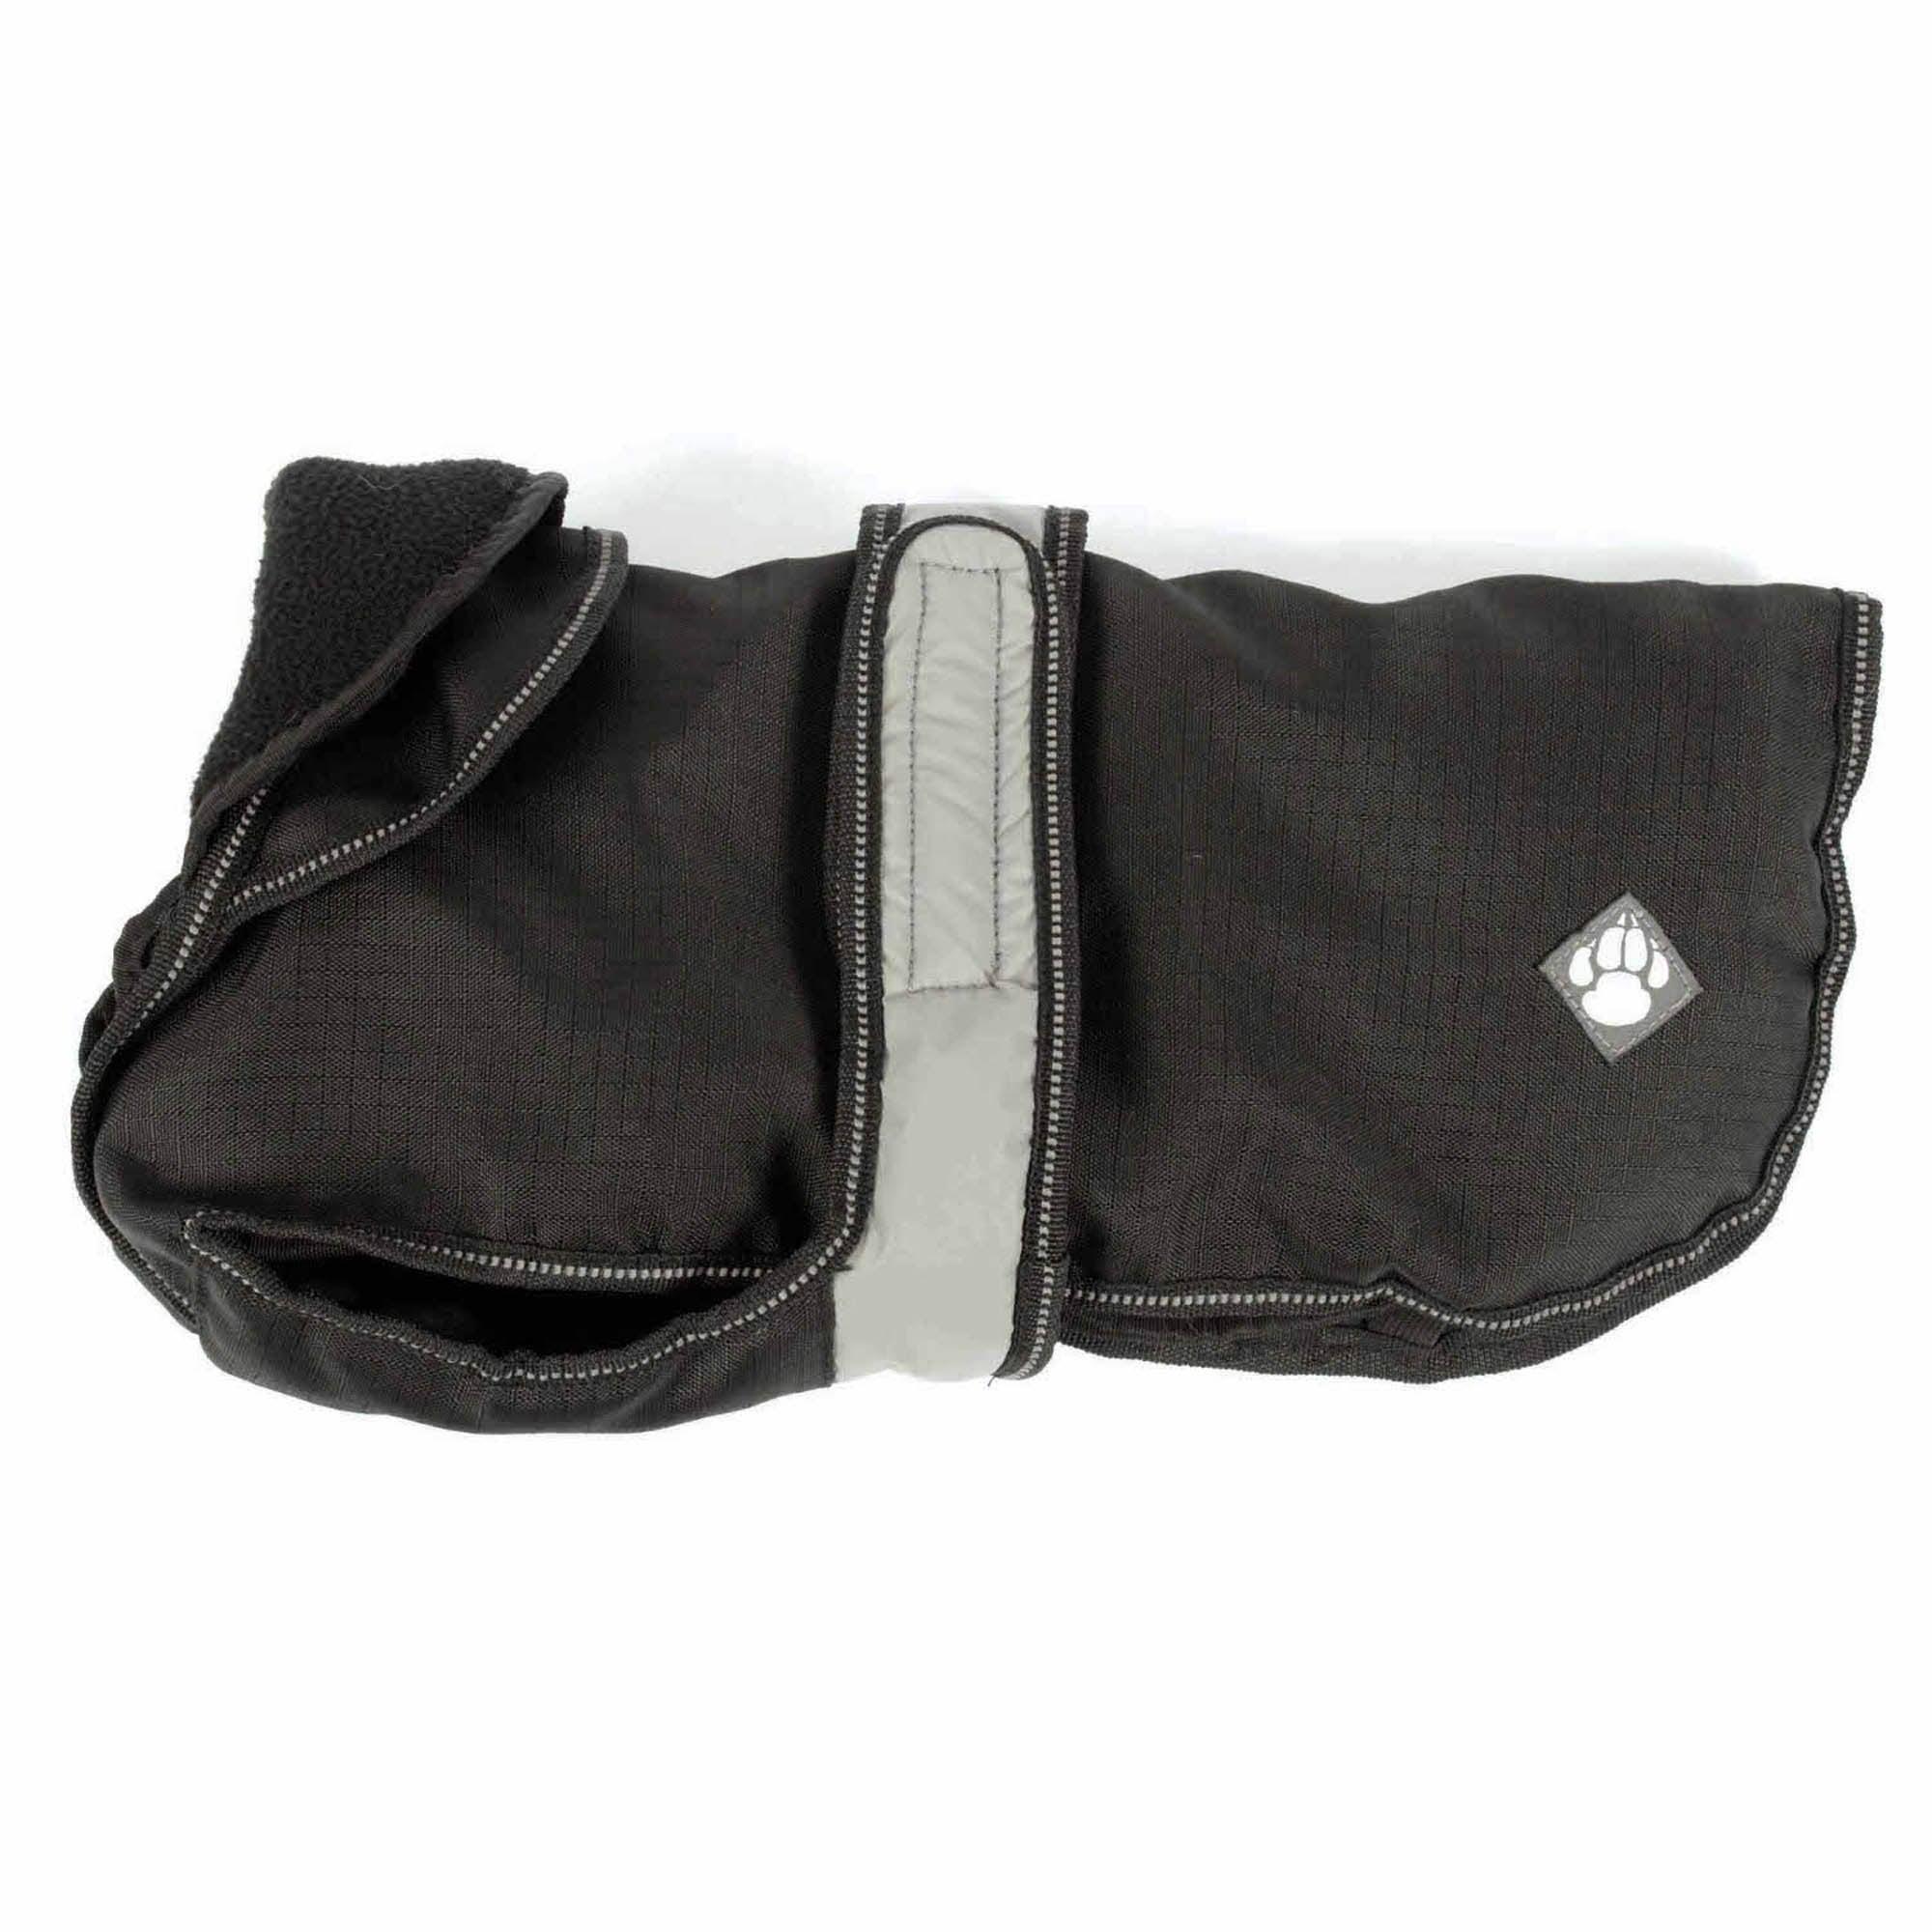 Danish Designs Ultimate 2 in 1 Dog Coat Black